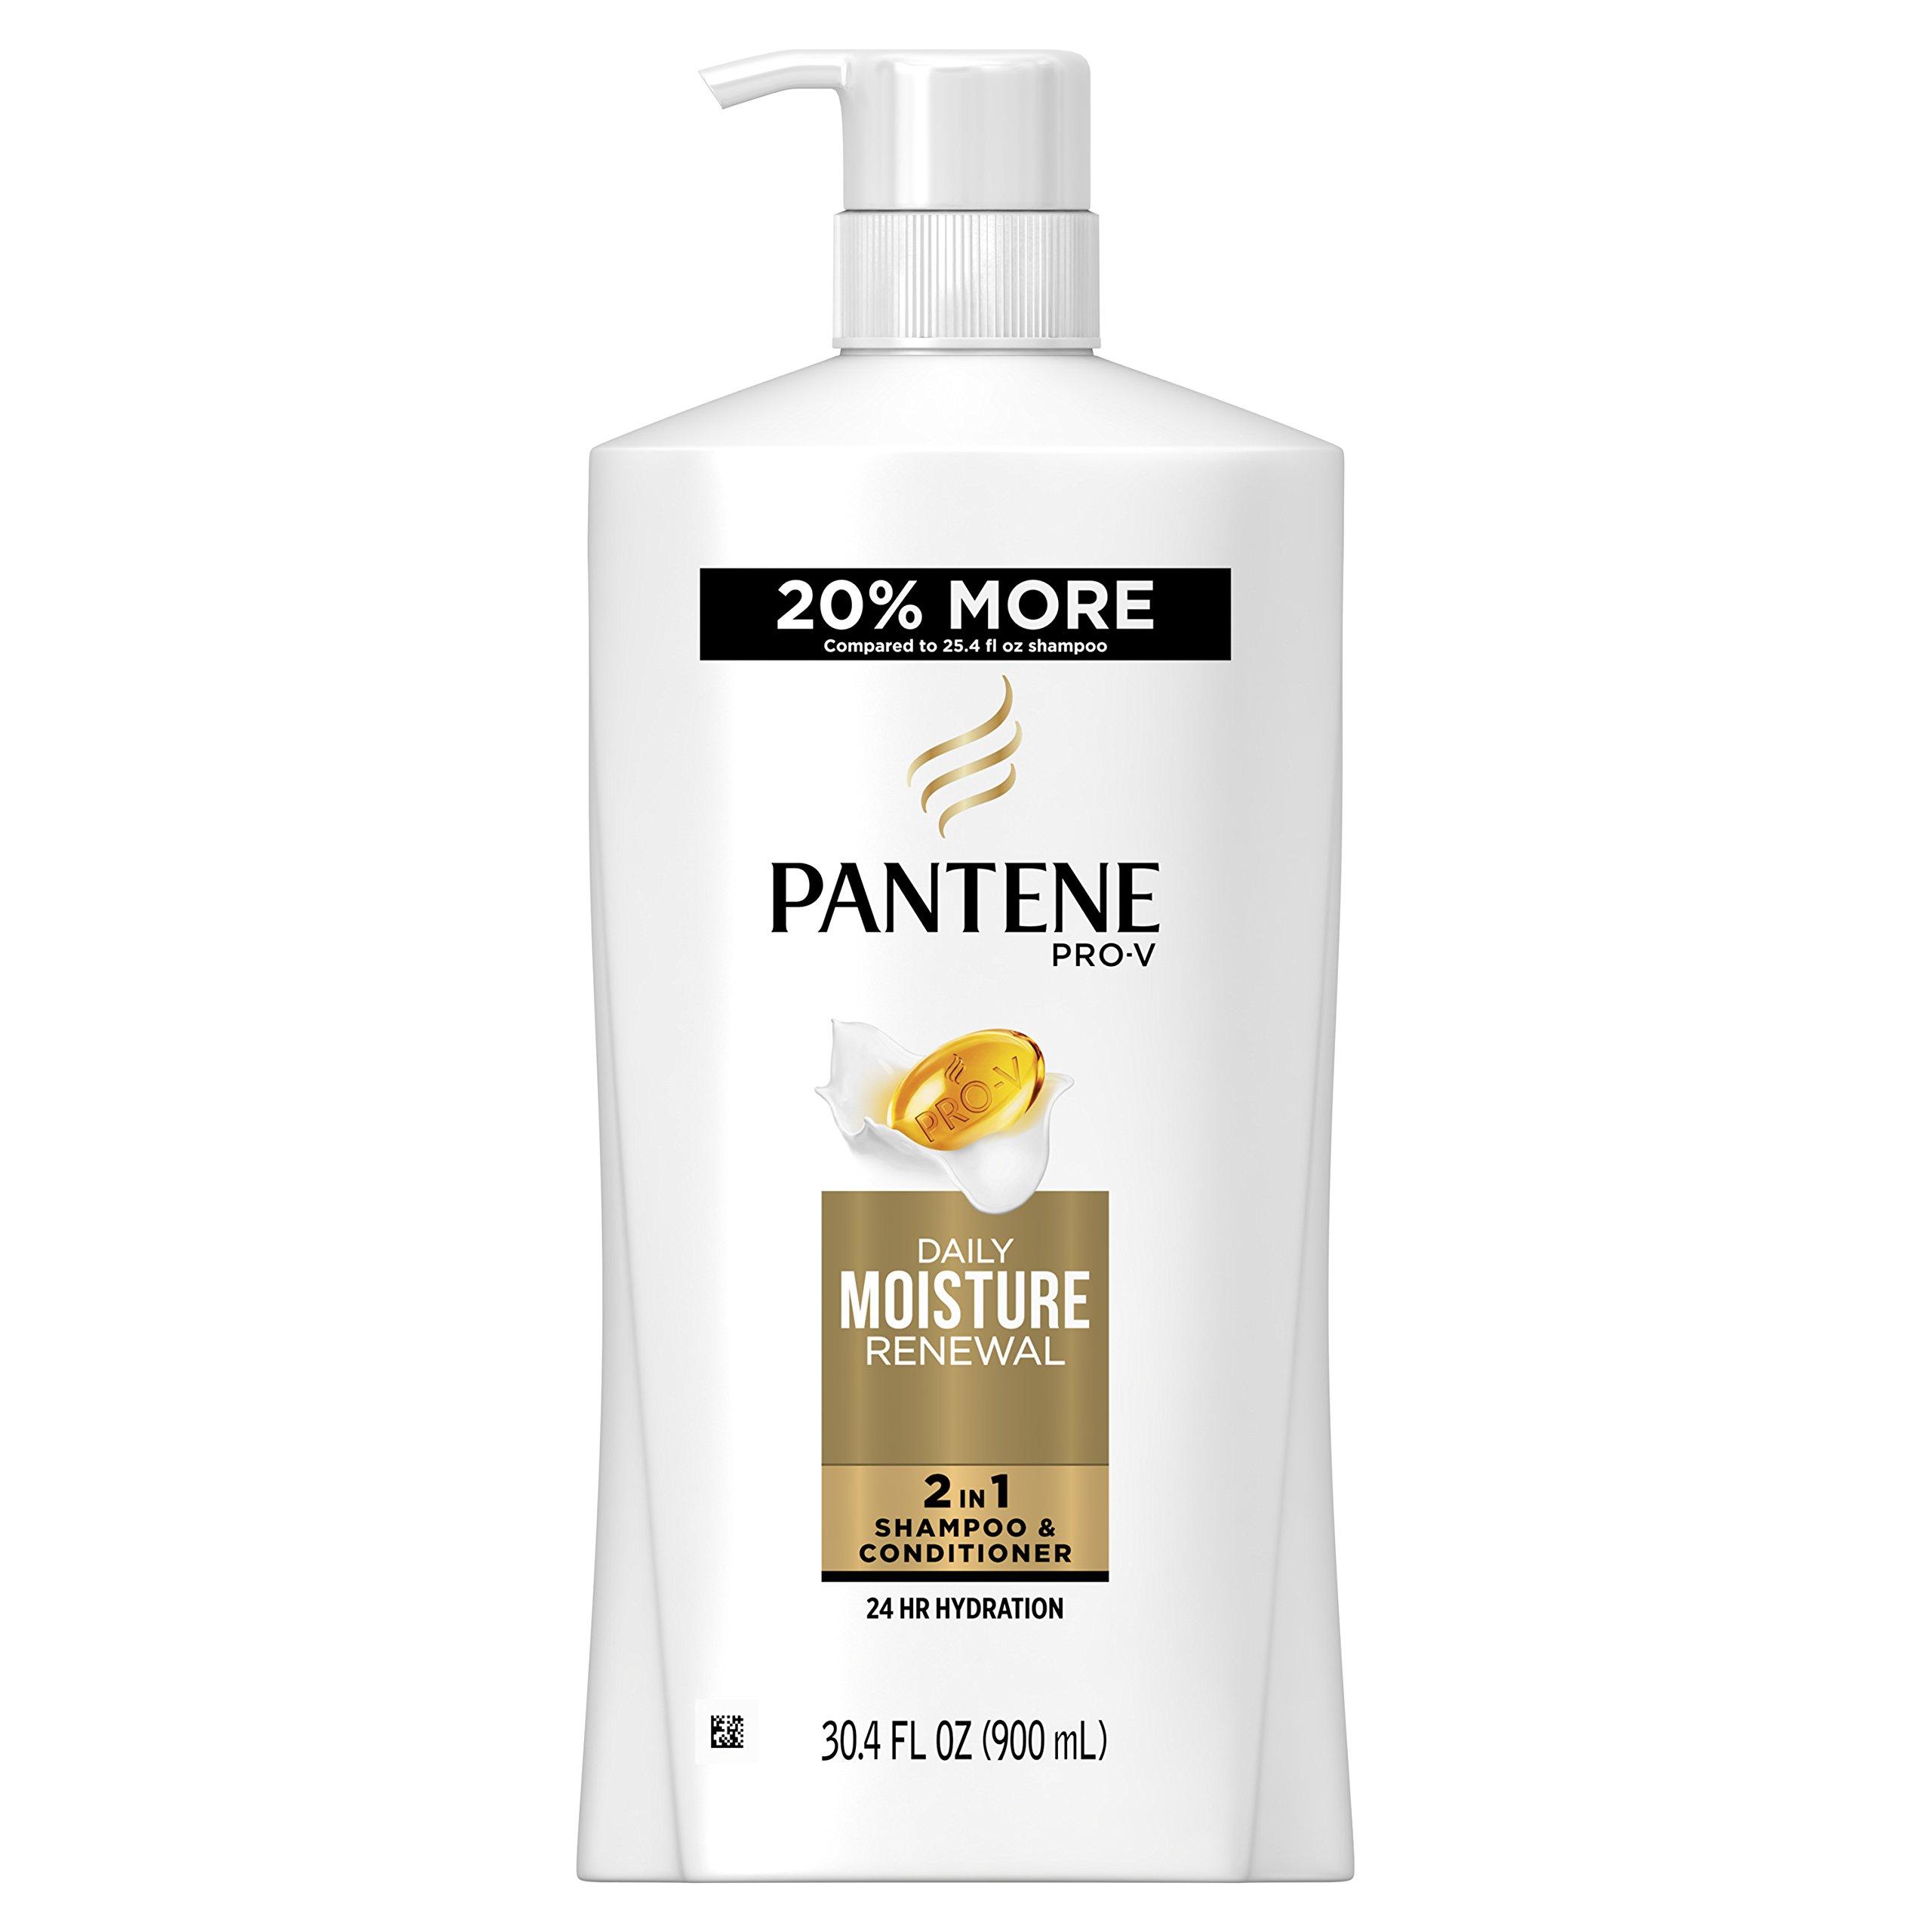 Pantene Pro-V Daily Moisture Renewal 2 In 1